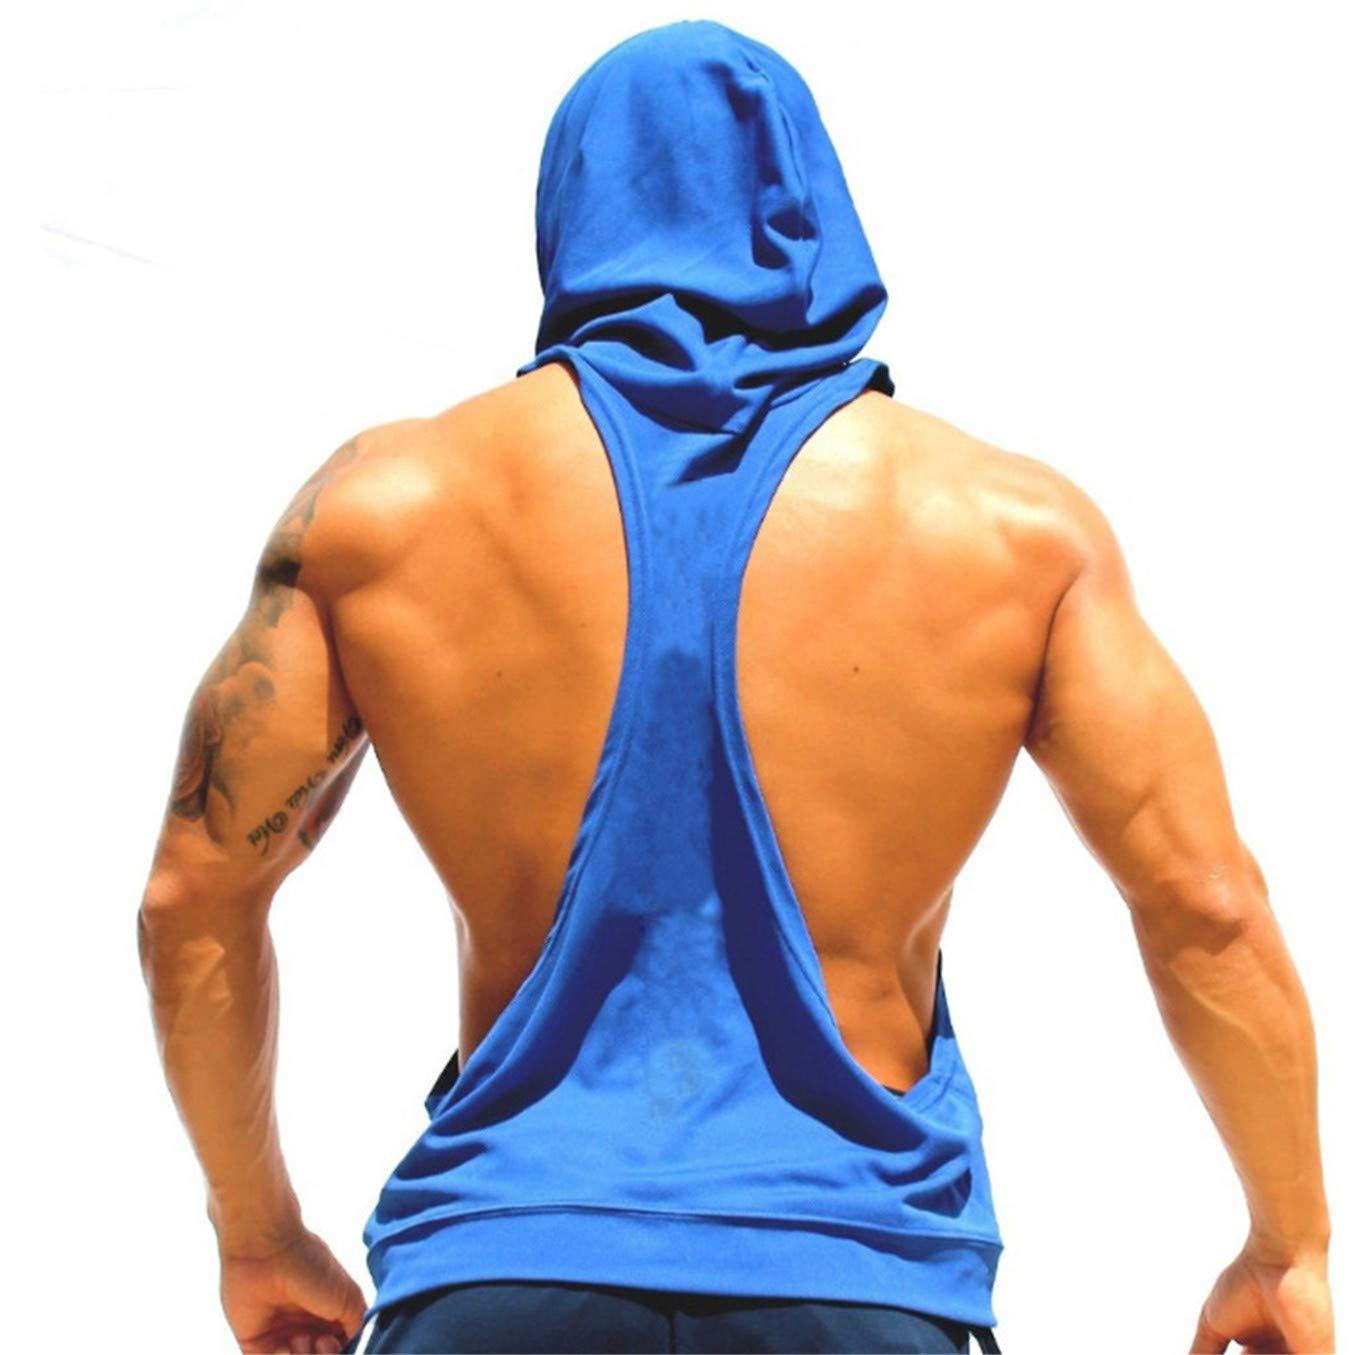 TIFENNY Men Fashion Hooded Vest Sling Running Yoga Gym Fitness Sport Shorts Breathable Sleeveless Tops Blue